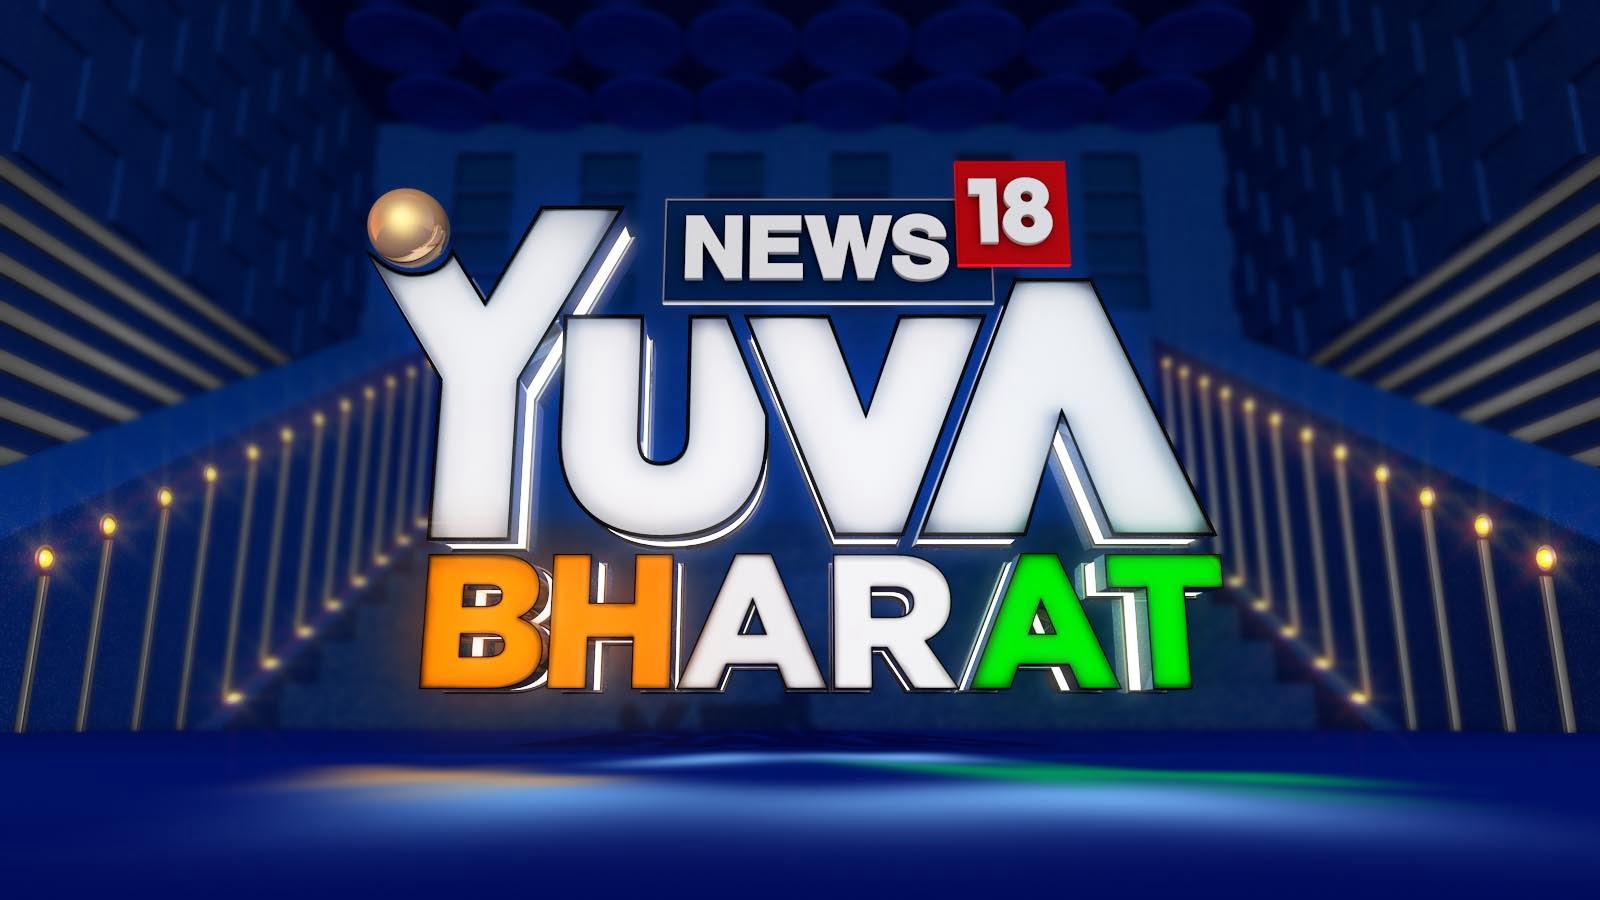 News18 Yuva Bharat